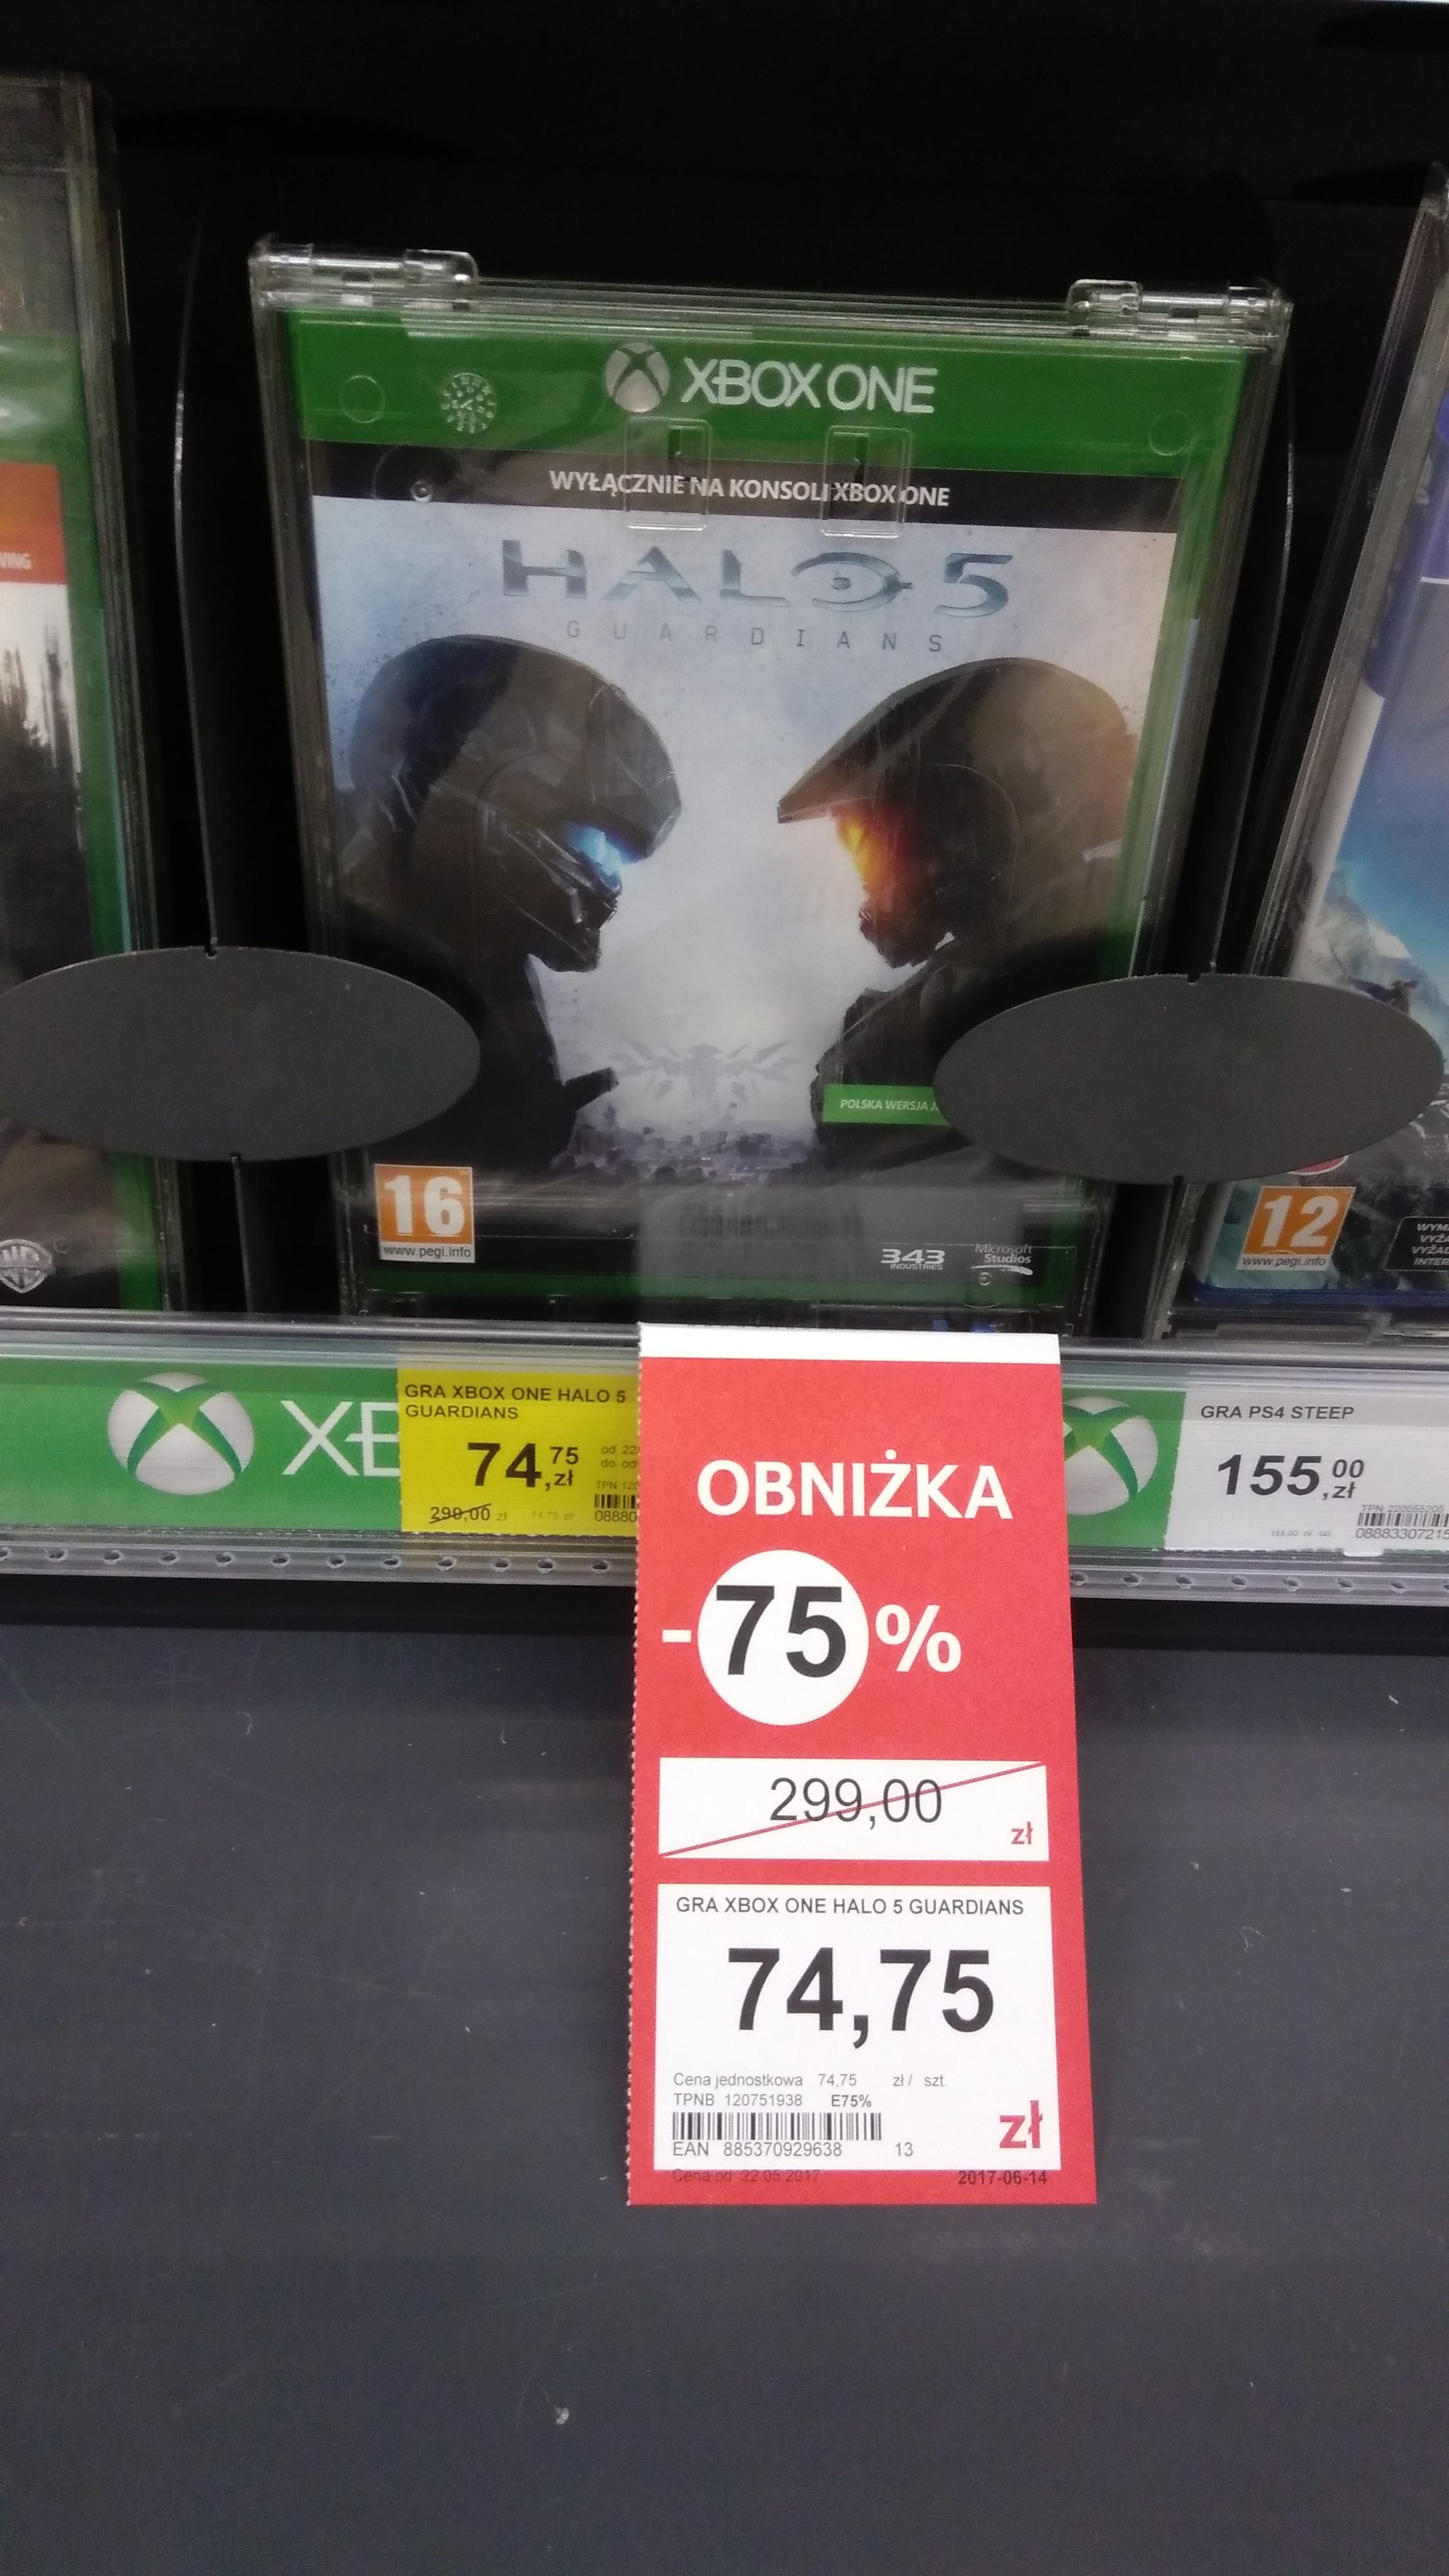 Gra HALO 5 Guardian Xbox One Tesco Katowice